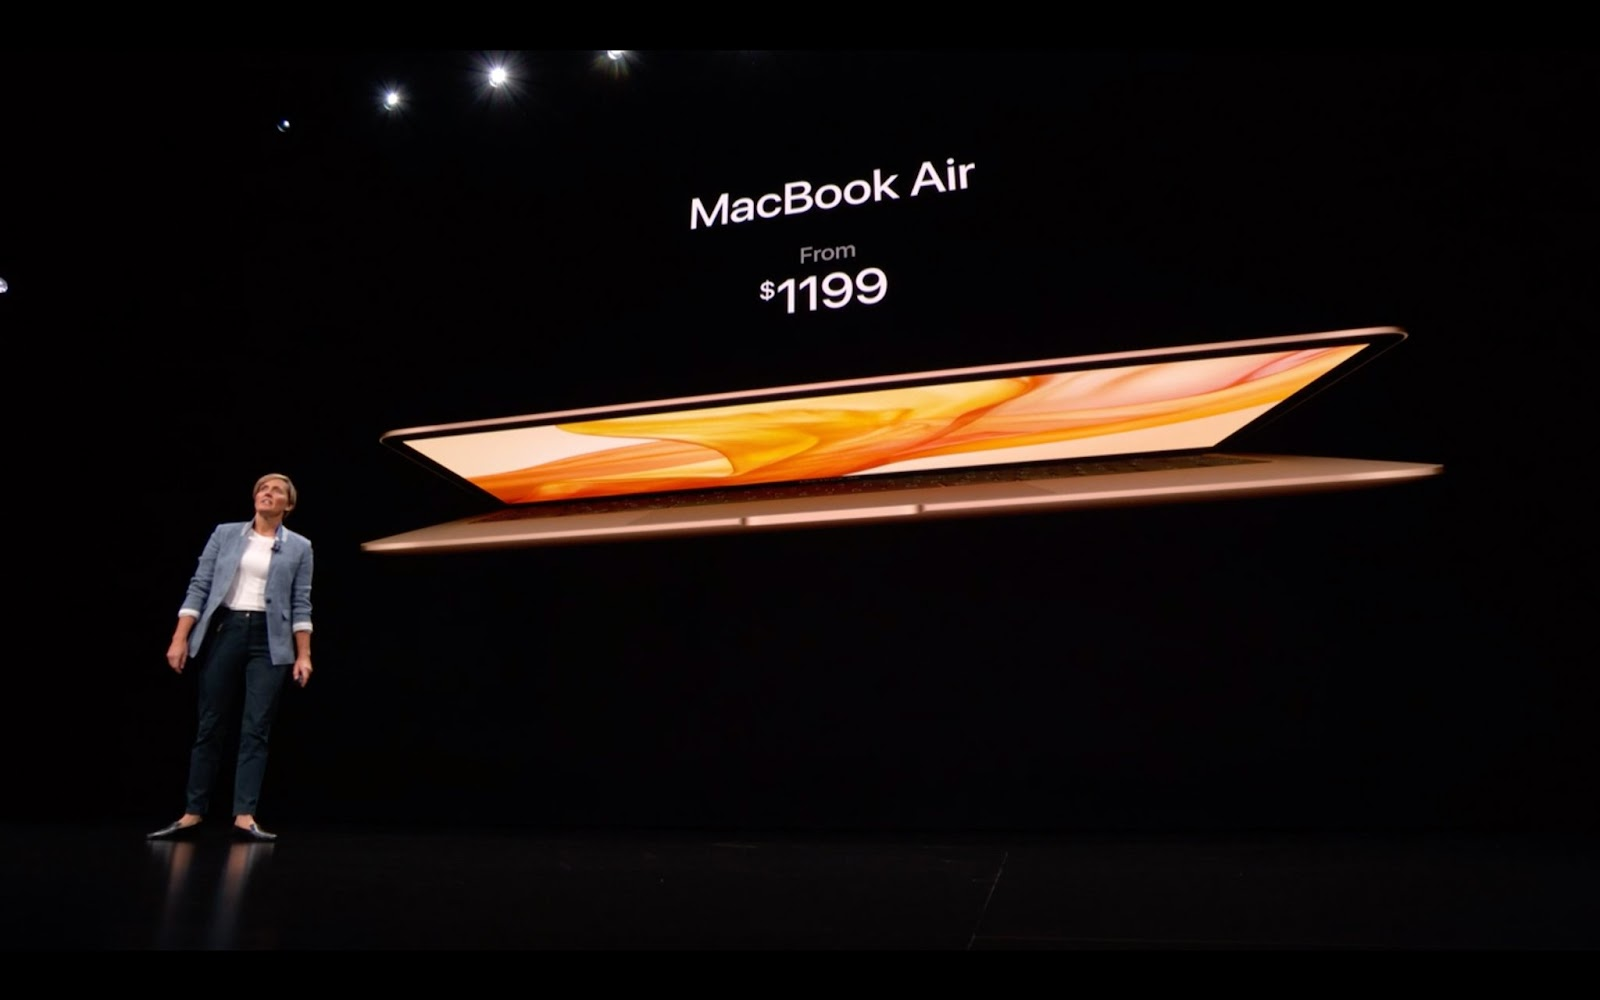 Đang tải Macbook_Air_2018_tinhte-36.jpg…